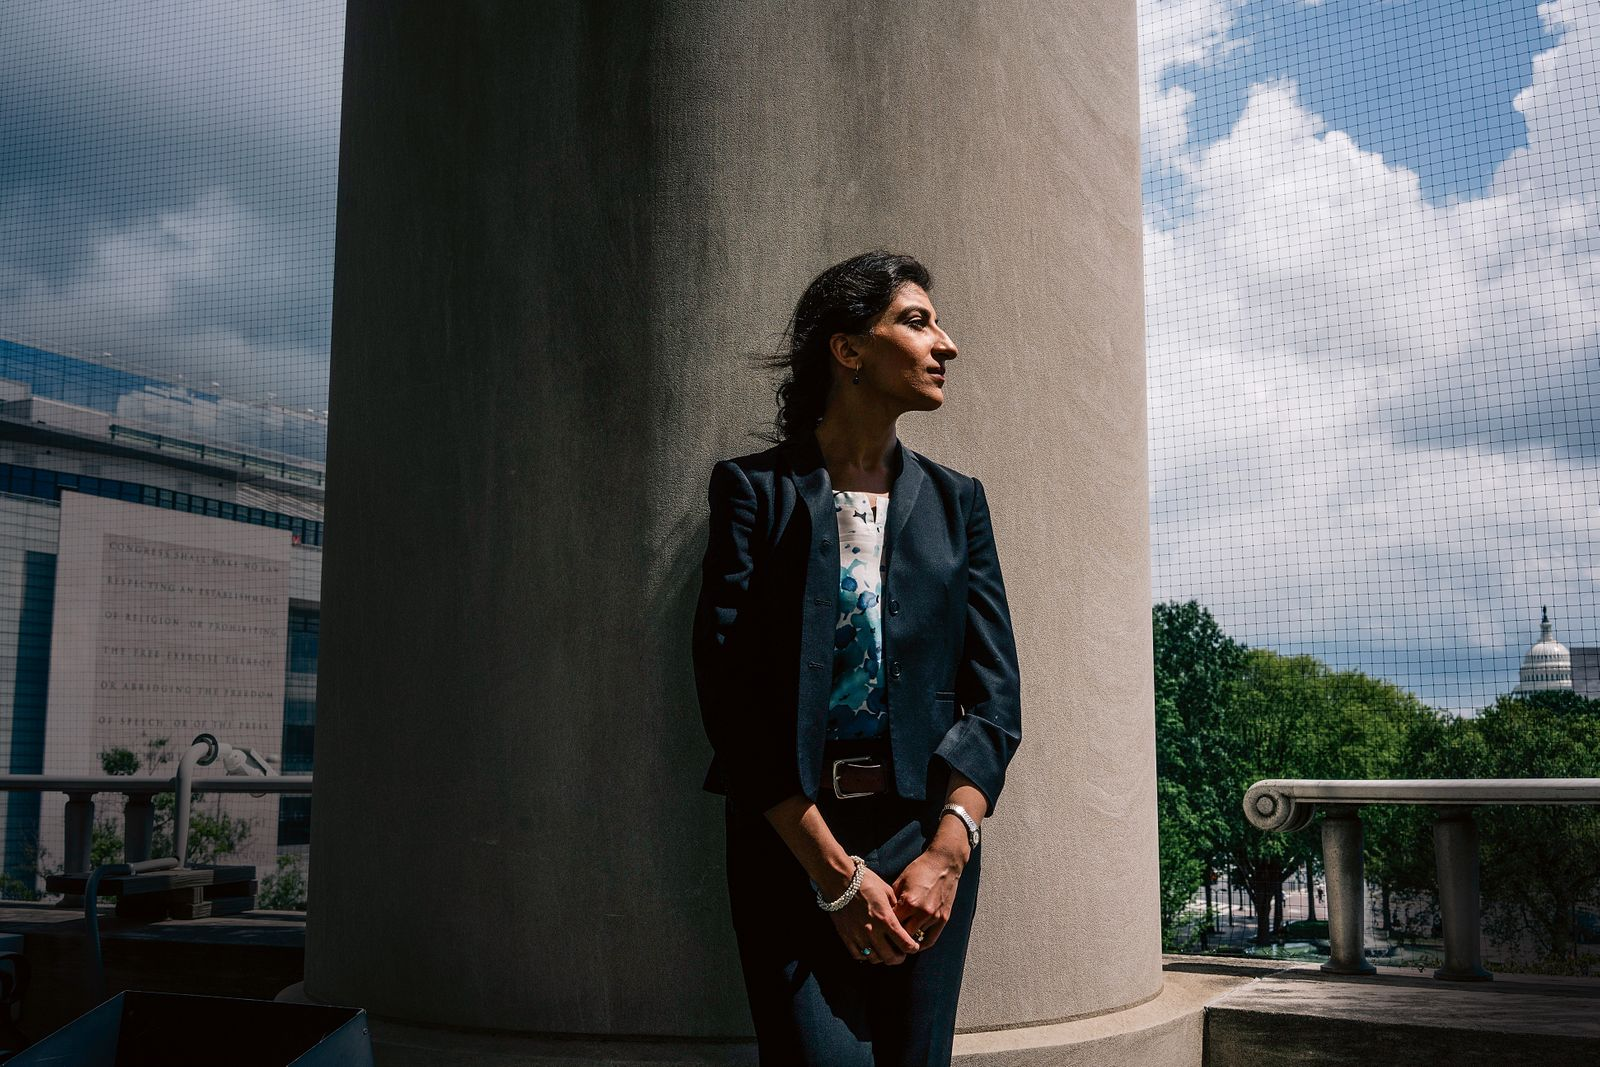 Lina Khan, a rising star in policymaking circles.